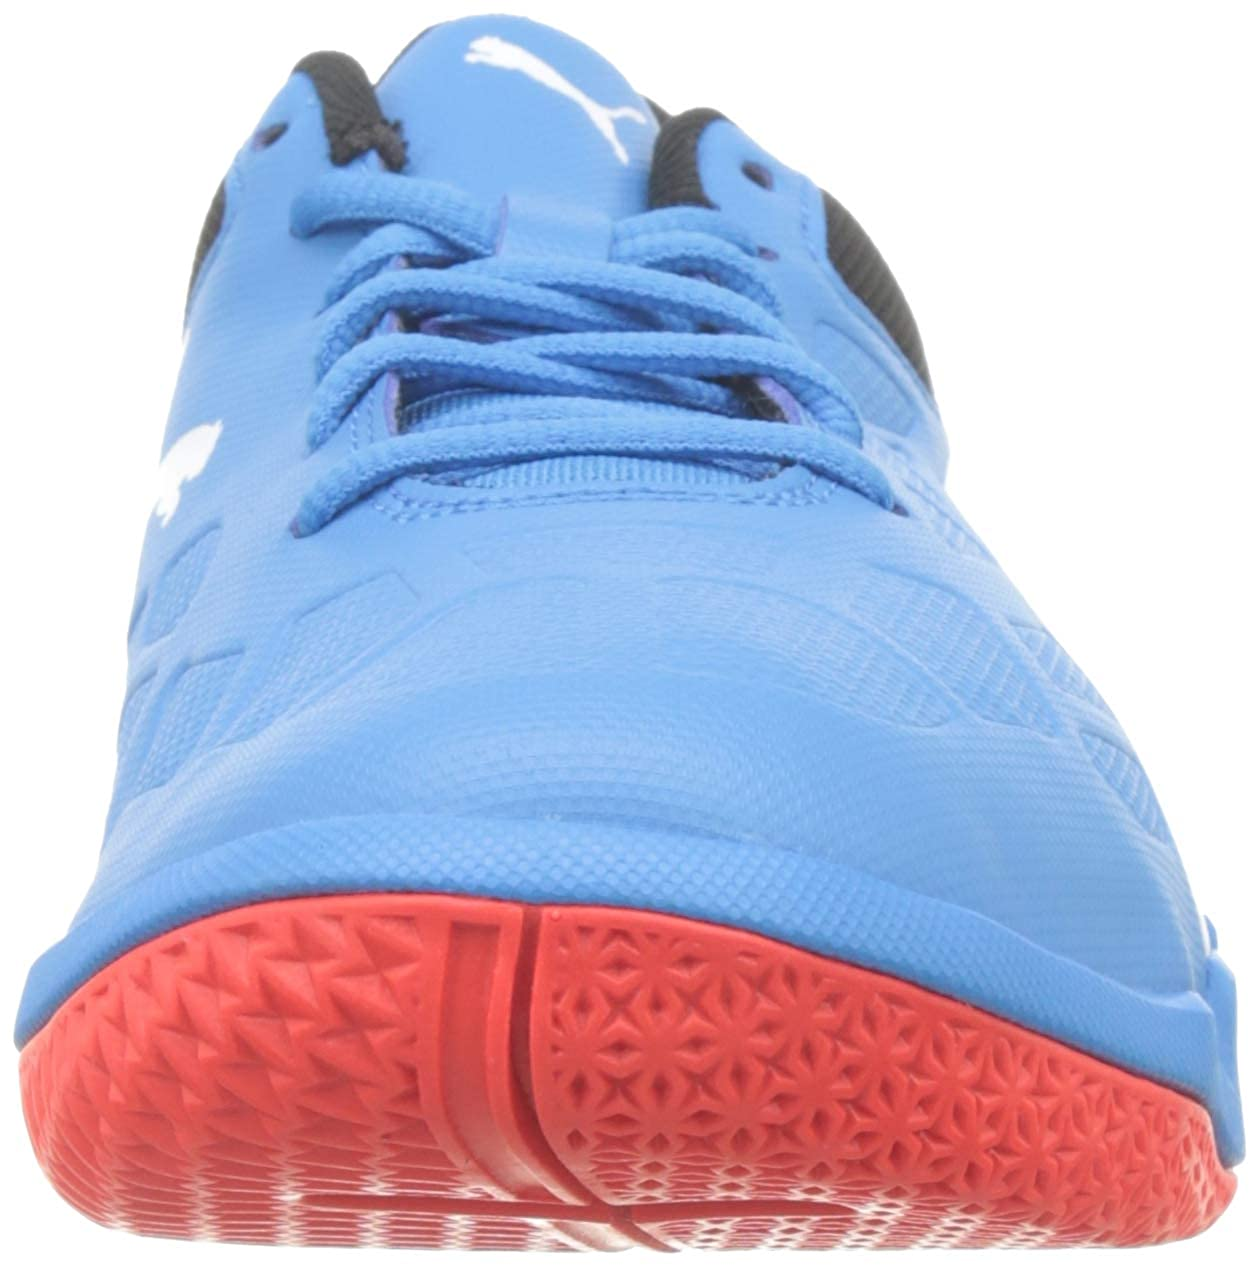 Puma Tenaz Jr Zapatos de Futsal Unisex Ni/ños